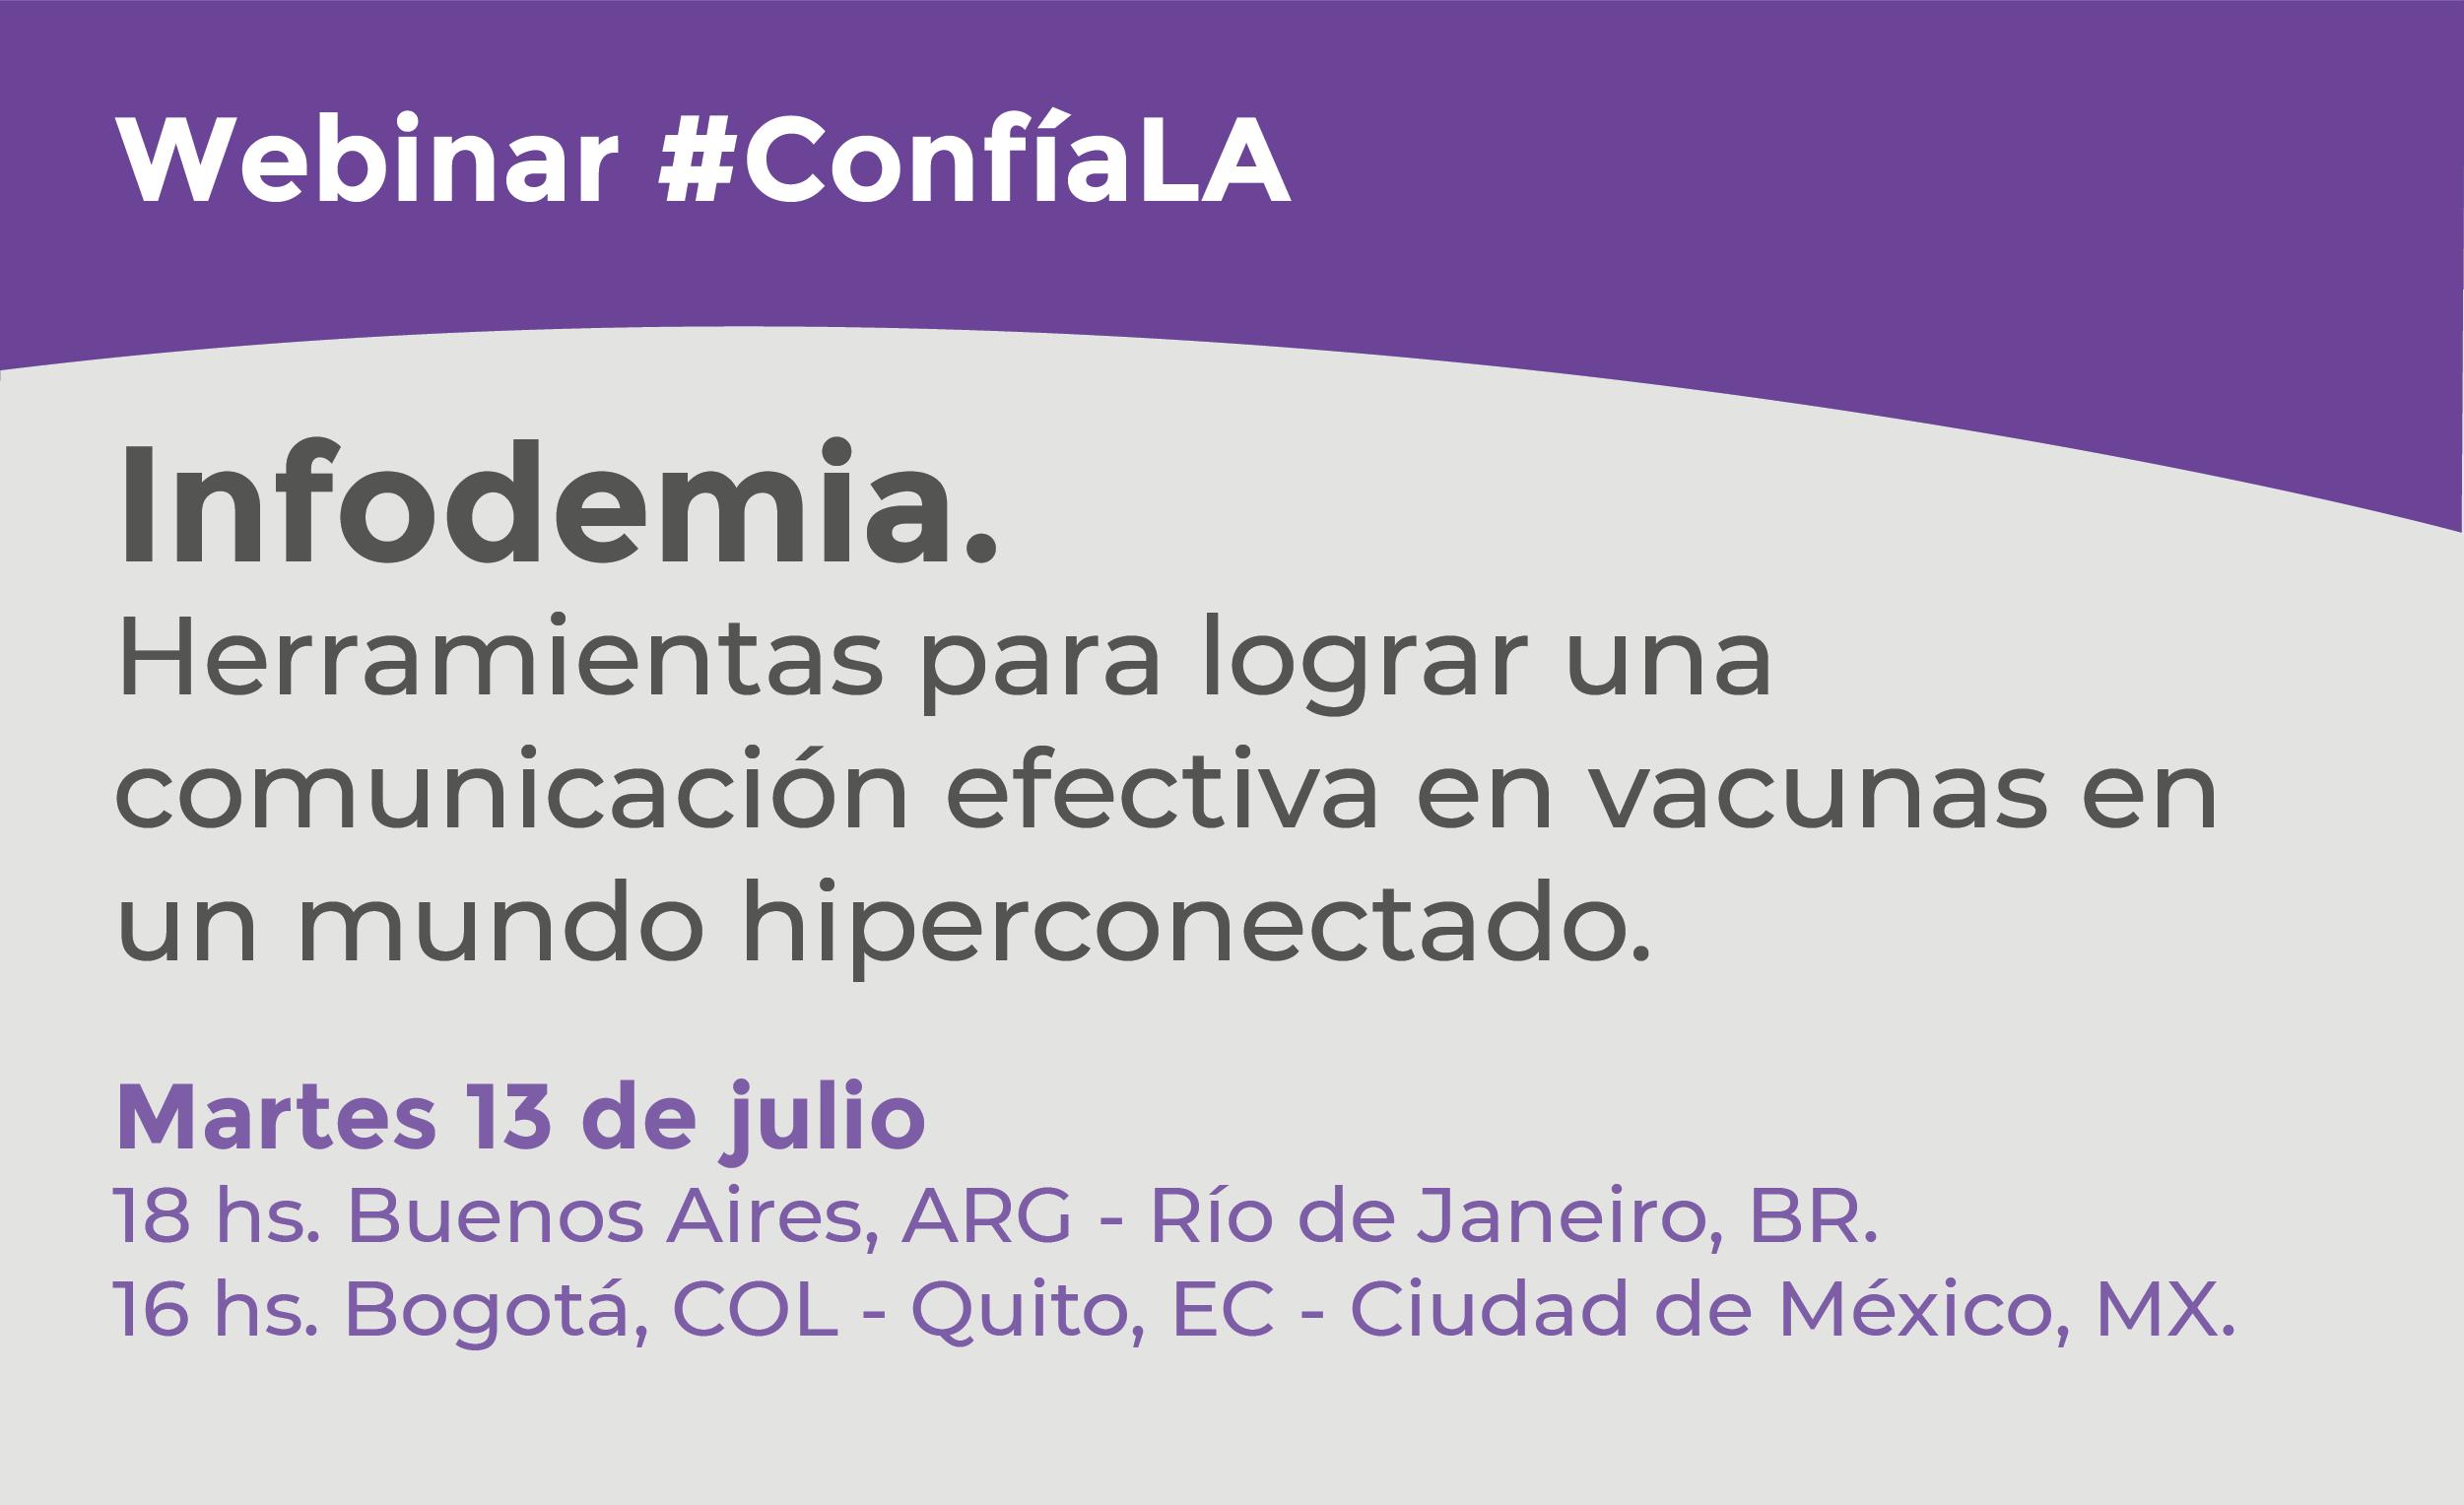 Webinar #ConfíaLA: Infodemia.